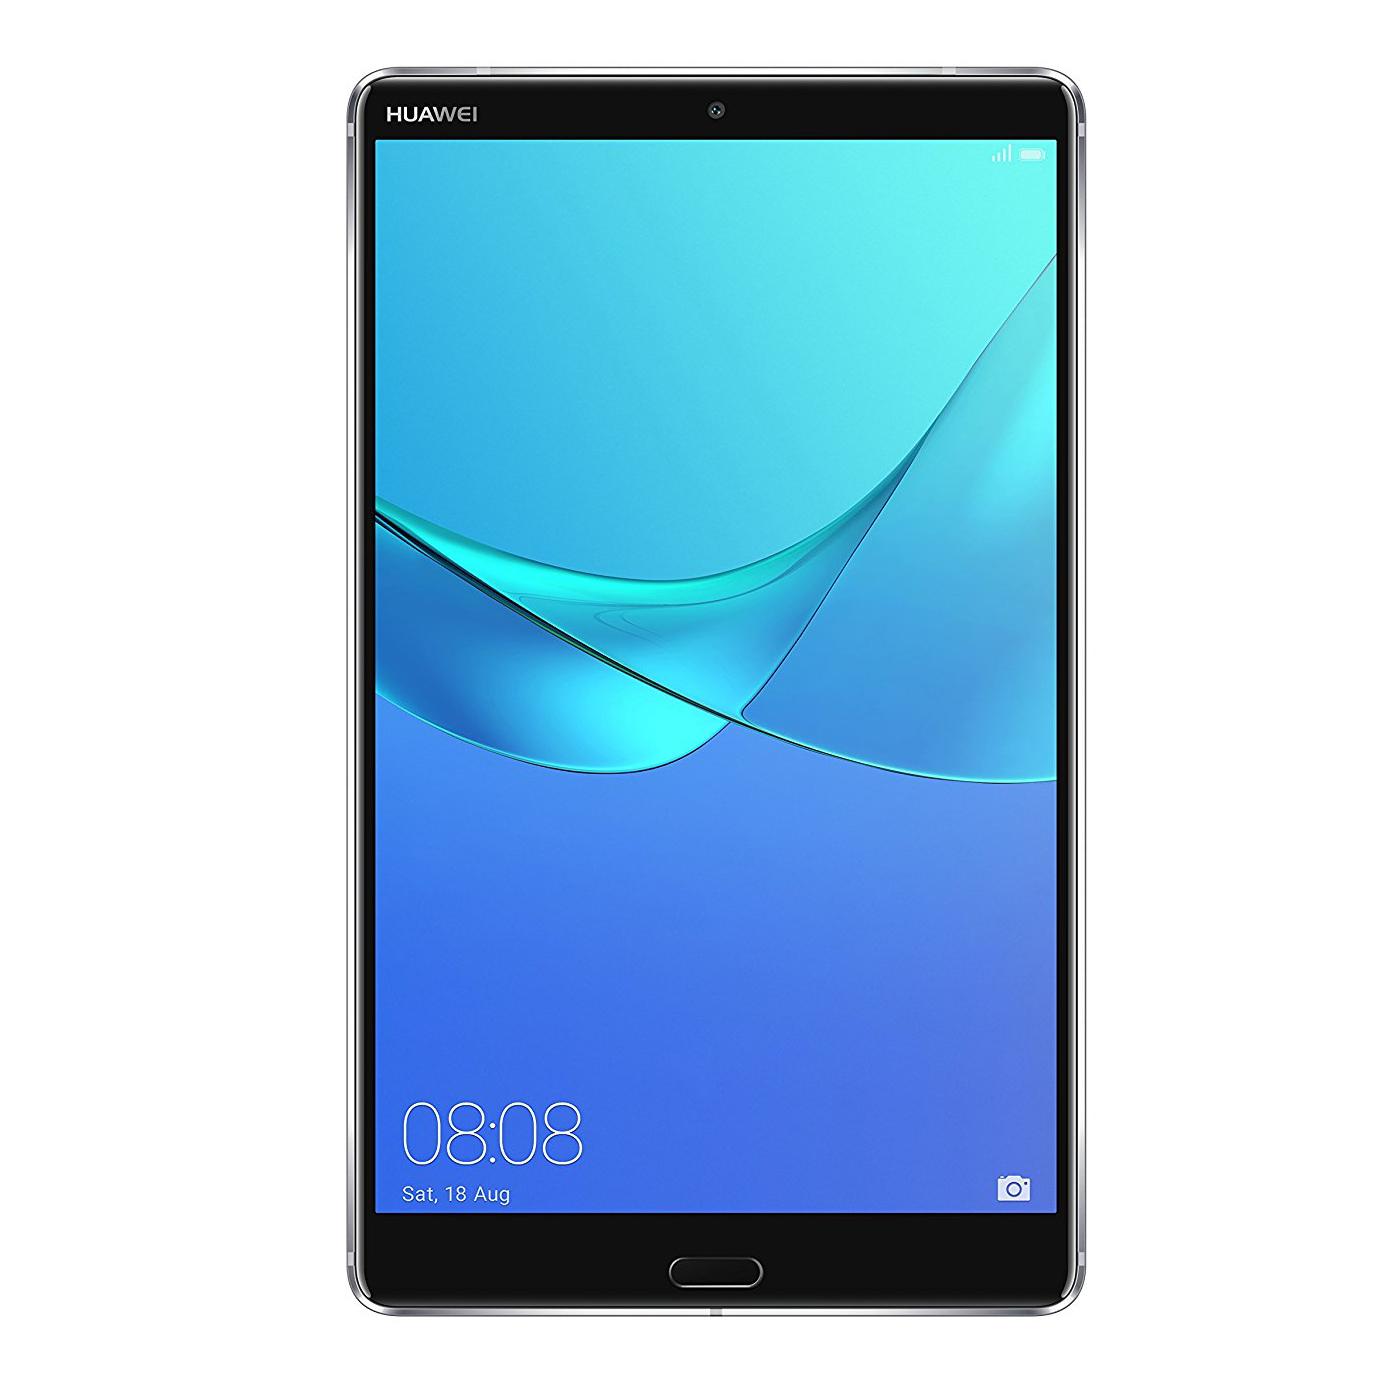 "Tablette tactile Huawei MediaPad M5 8.4"" Gris Wi-Fi Tablette Internet - Kirin 960 8-Core 2.4 GHz - RAM 4 Go - 32 Go - Écran IPS 8.4"" 2K - Wi-Fi/Bluetooth 4.2 - Webcam - Android 8.0"